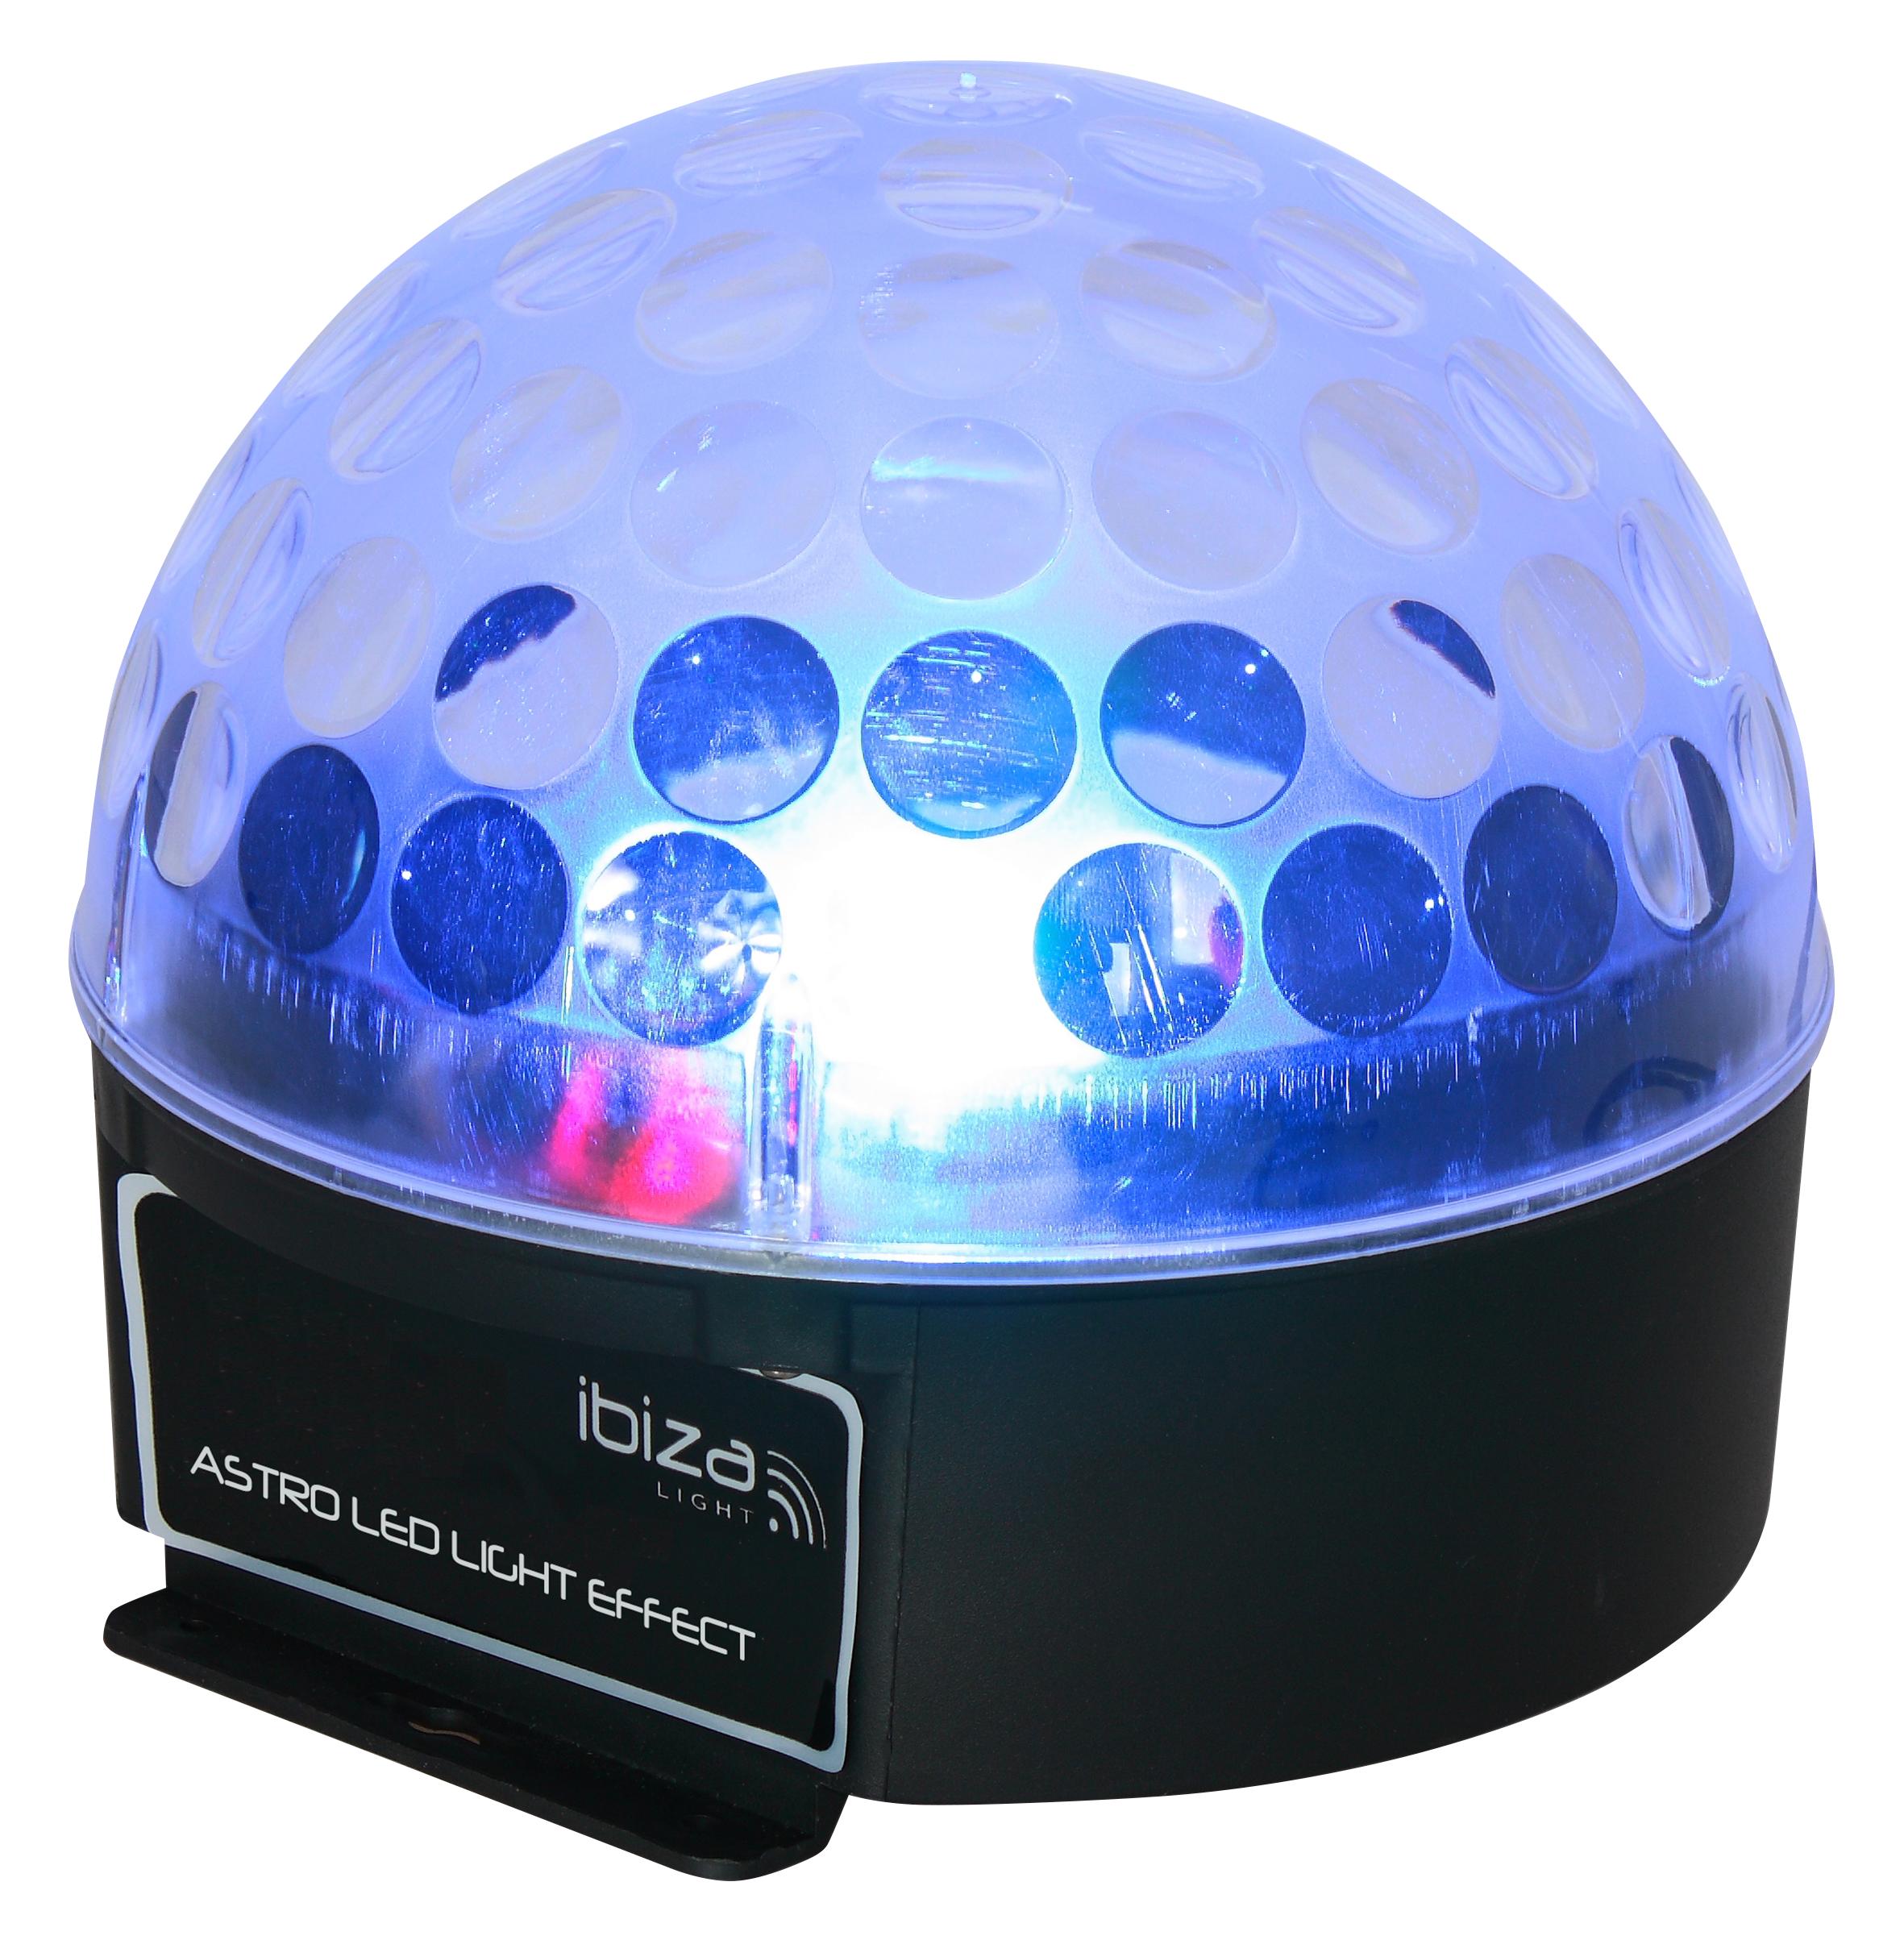 LED-Lichteffekt IBIZA ''ASTRO1'' 3x 3W RGB-LEDs, 81 Linsen